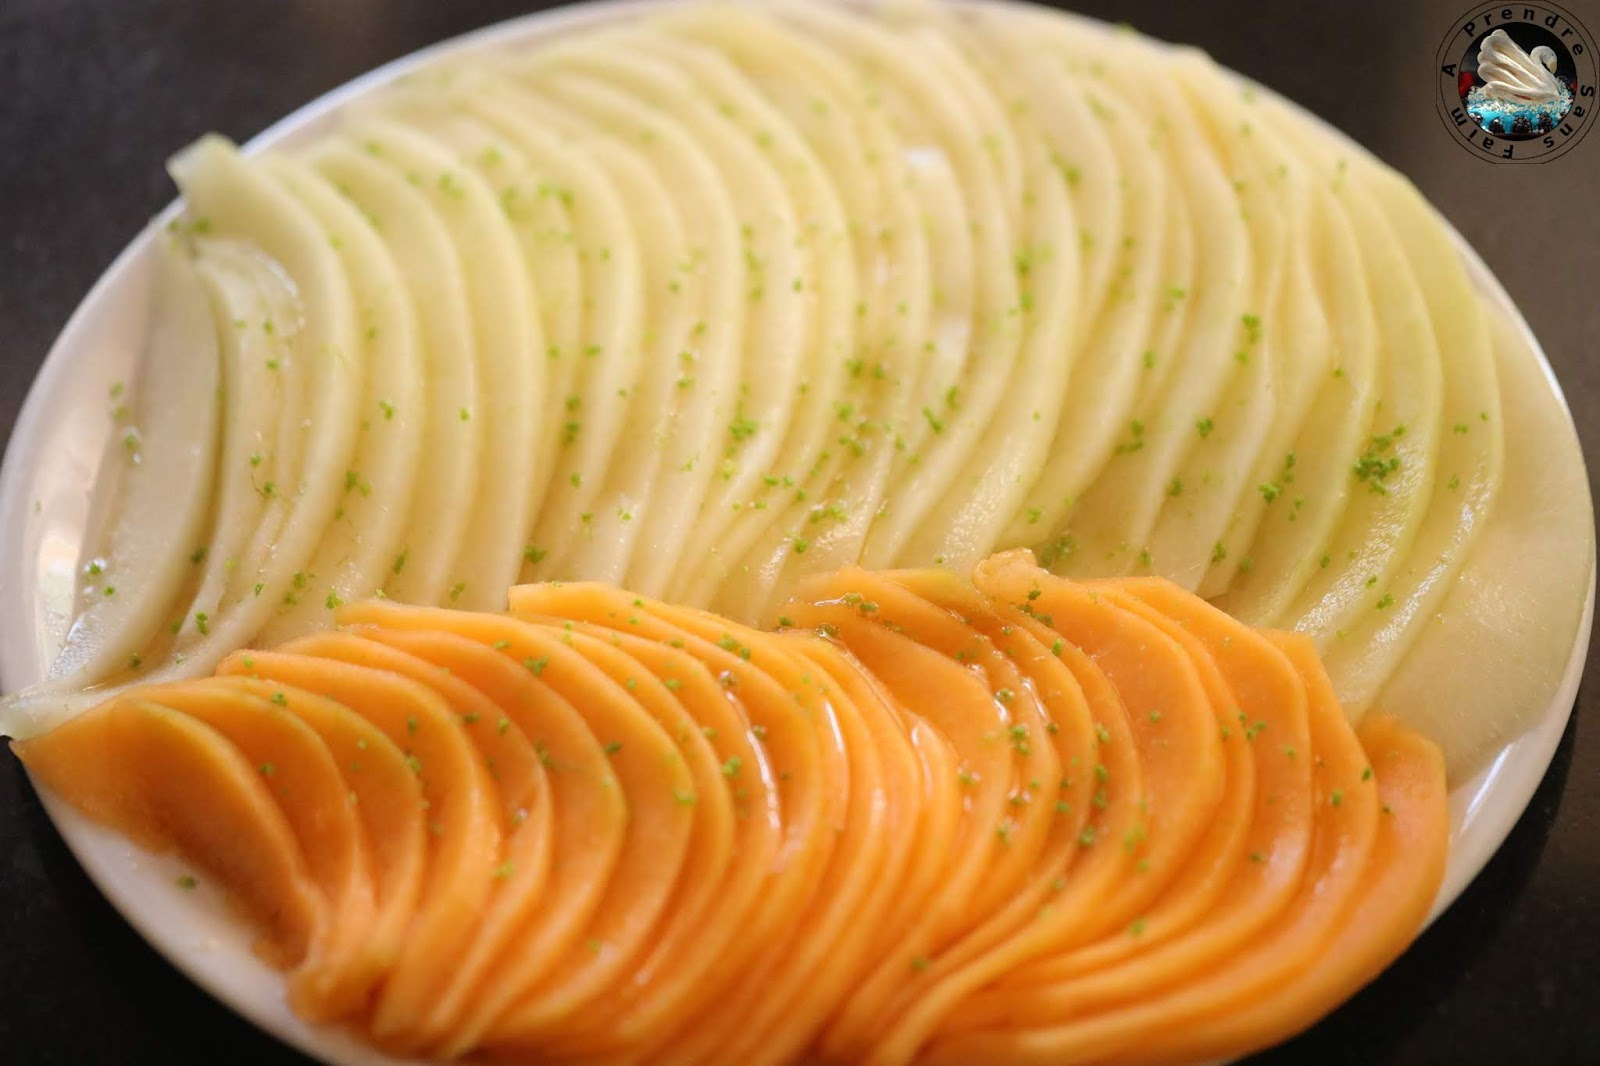 Carpaccio de melon au citron vert